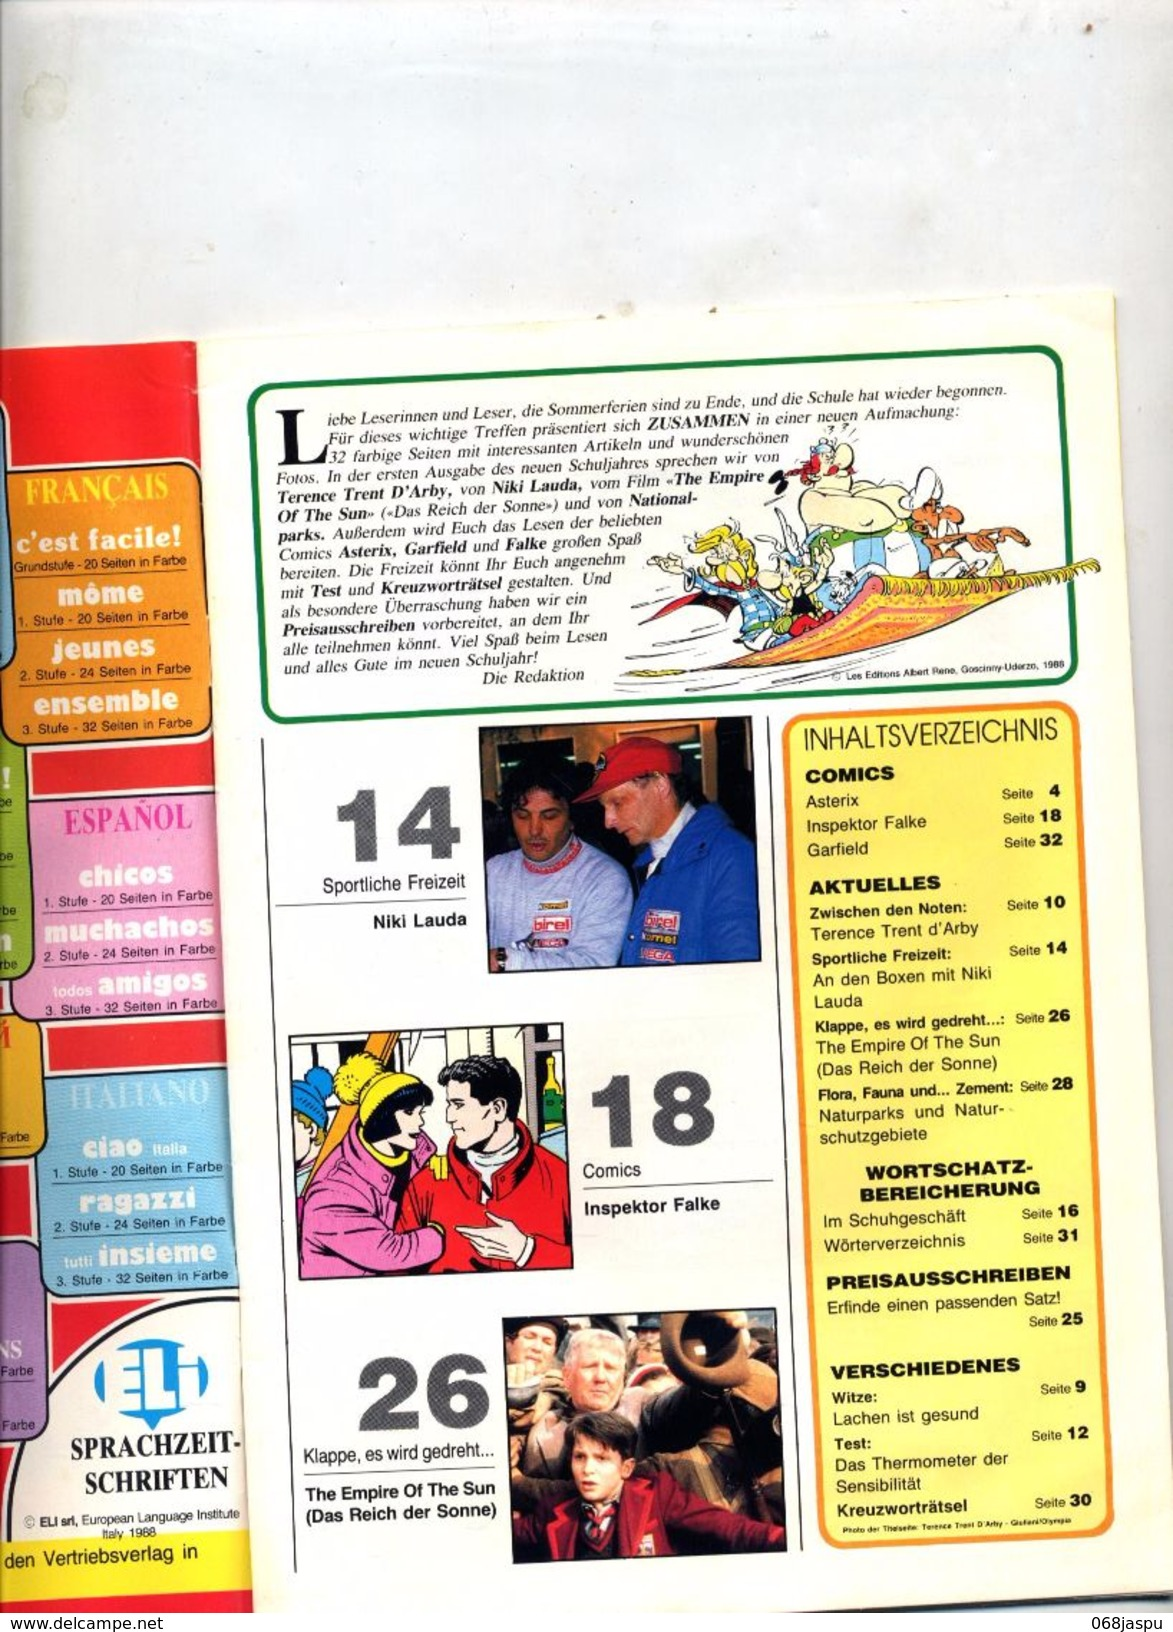 Revue Zu Sammen Septembre 1988 Theme Asterix Lauda Garfield - Revues & Journaux